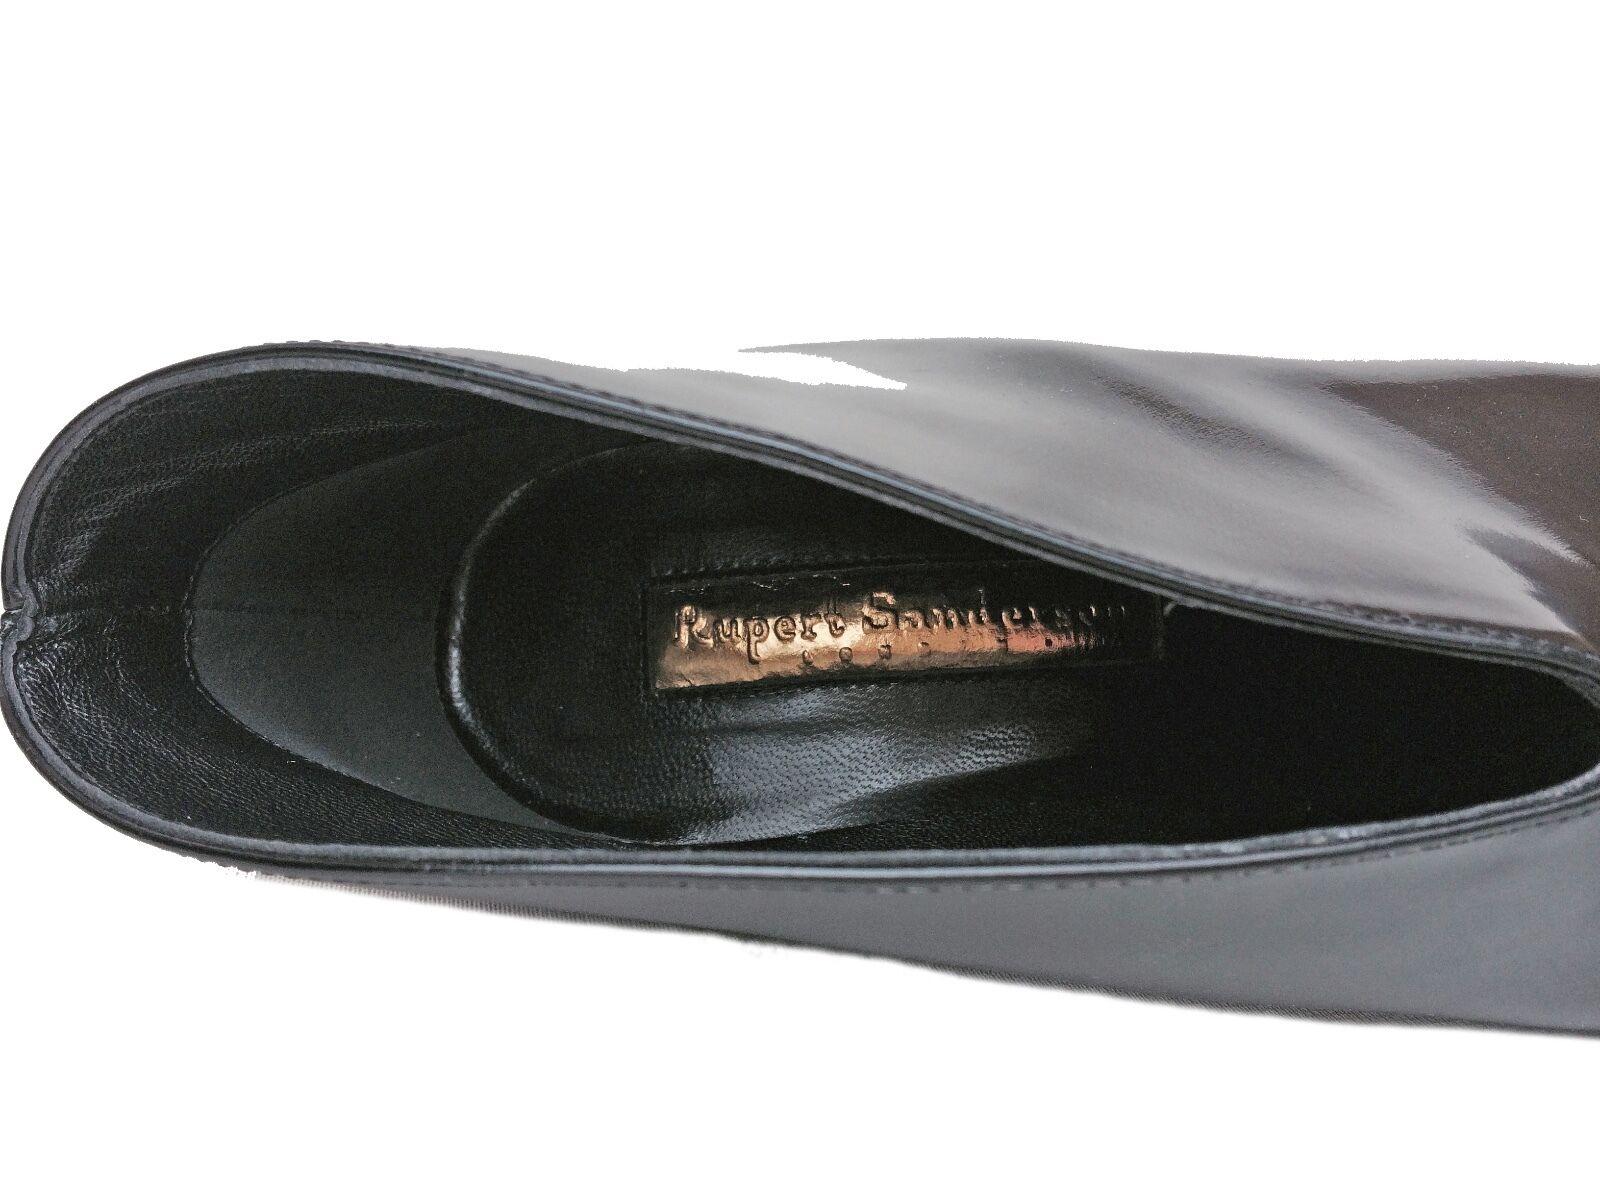 Rupert Sanderson + Designer Celebrity Ankle Boots Boots Boots shoes 40 EU (7 UK) Black cf377d